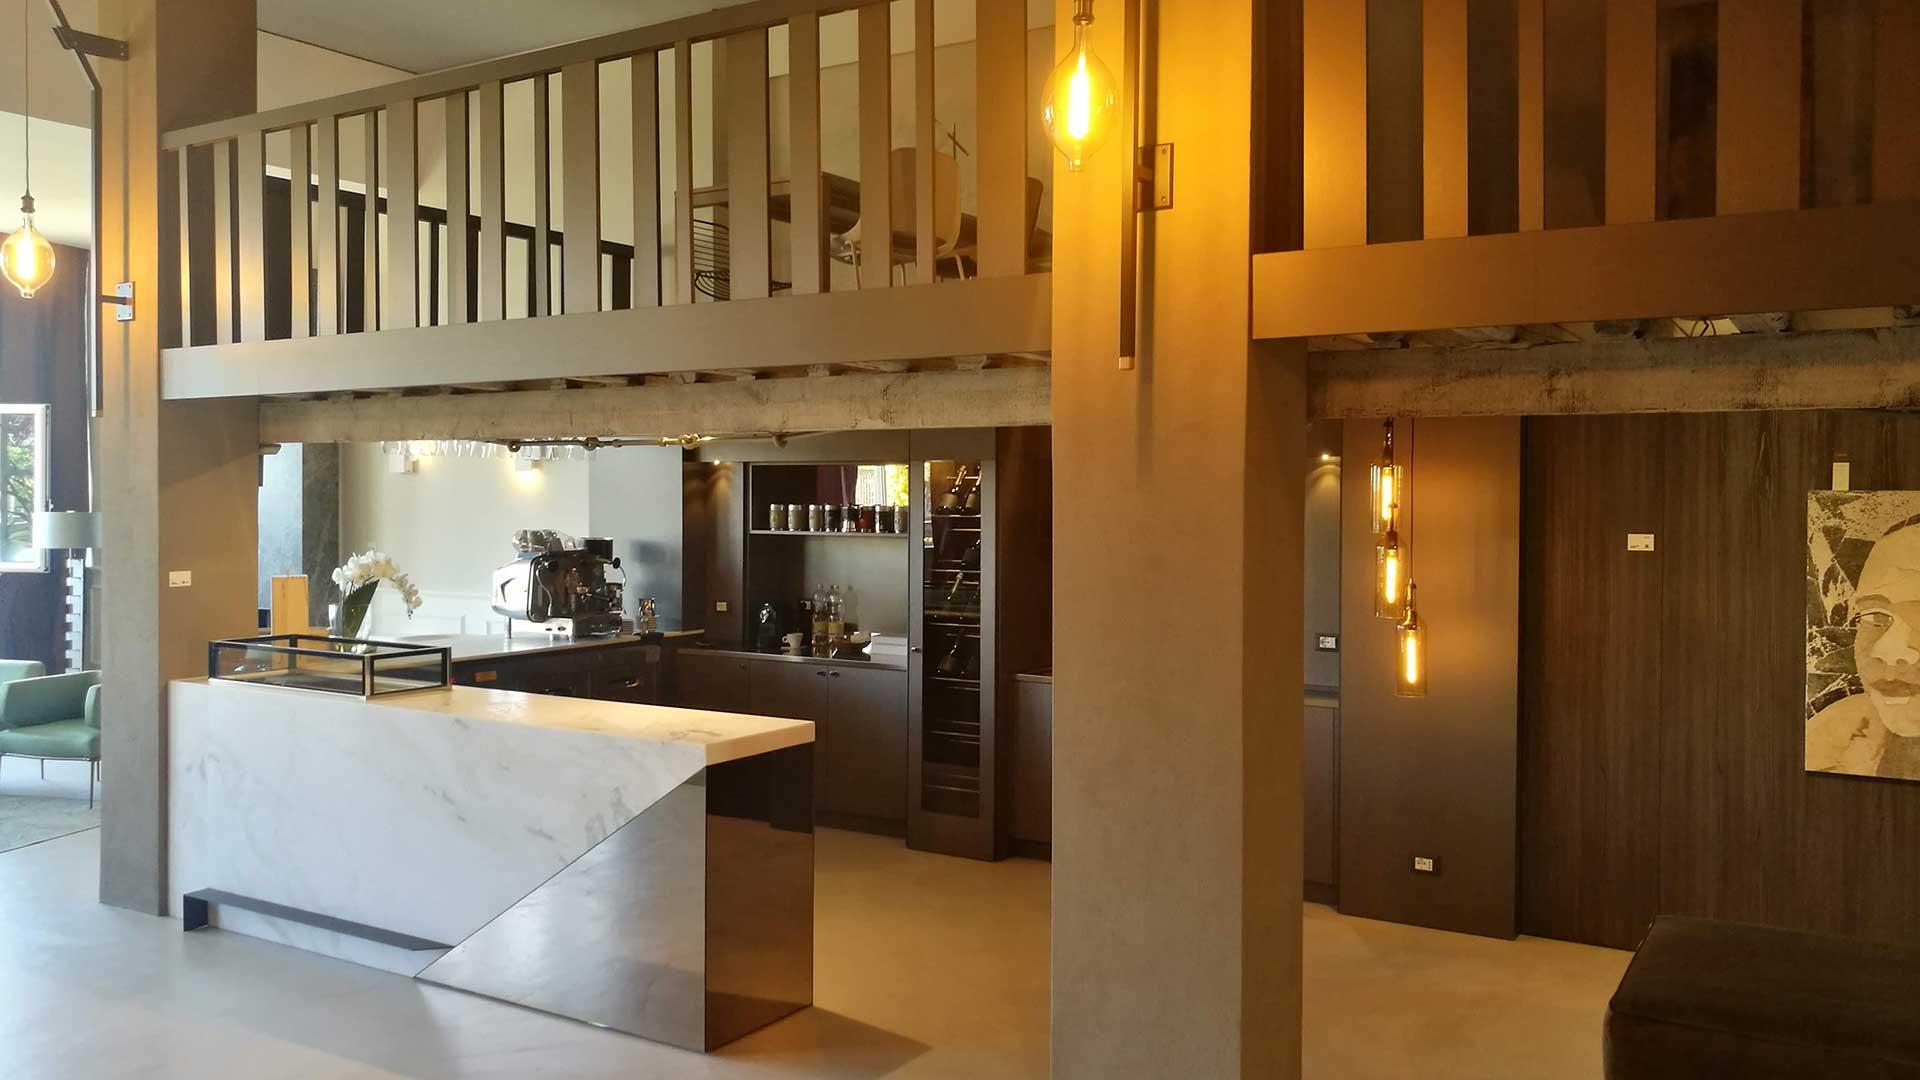 Concept Room - Arredamento bar